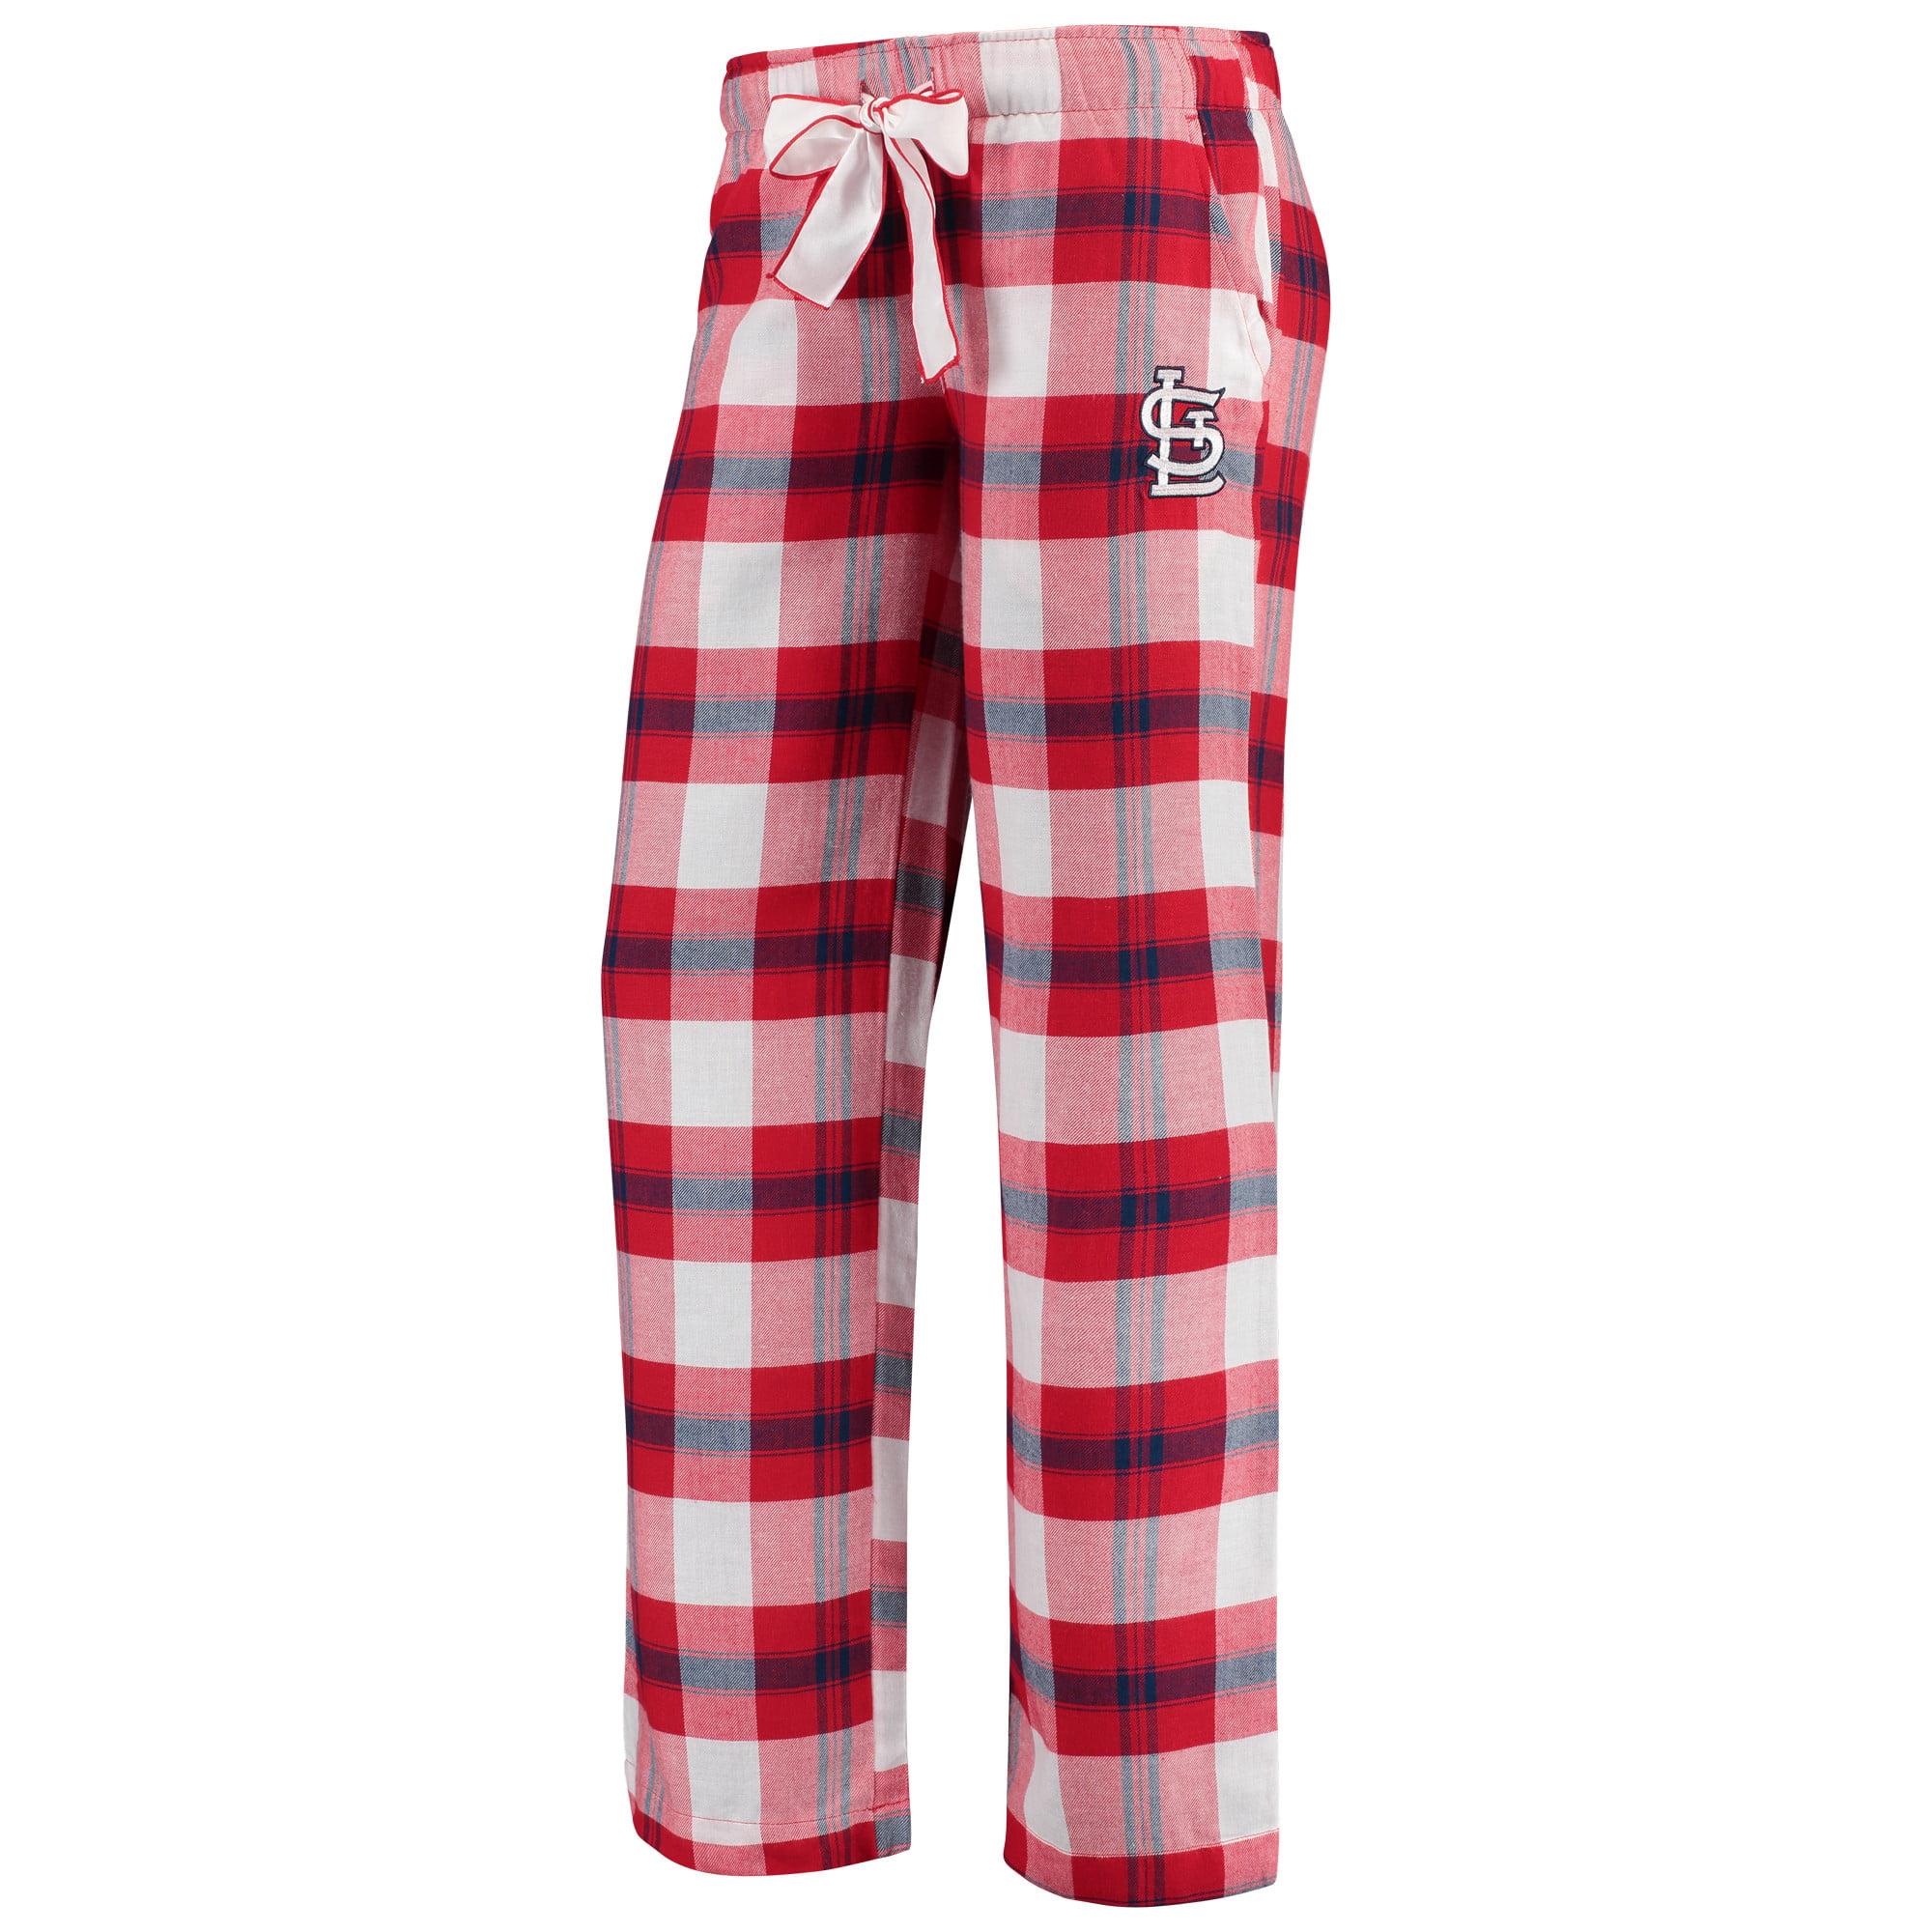 St. Louis Cardinals Concepts Sport Women's Headway Flannel Pants - Red/Navy